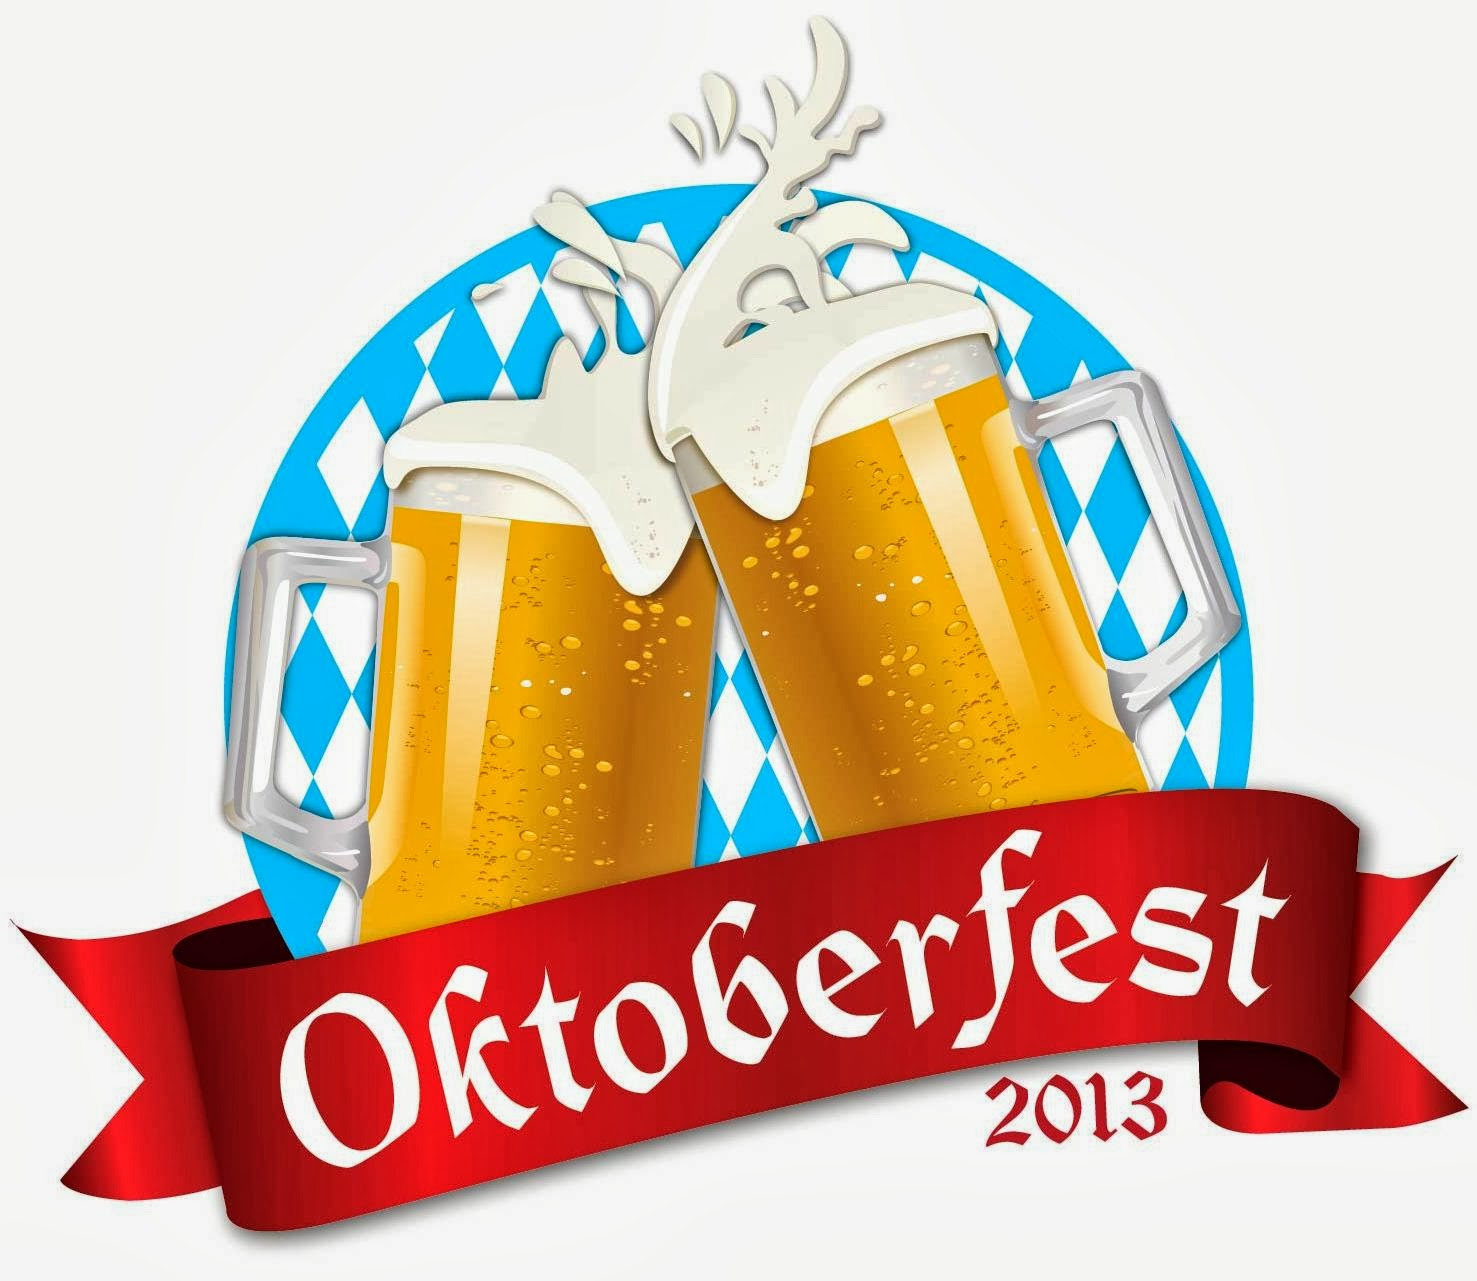 GAB Oktoberfest Malaysia 2013 Is Here! | Isaactan.net ...